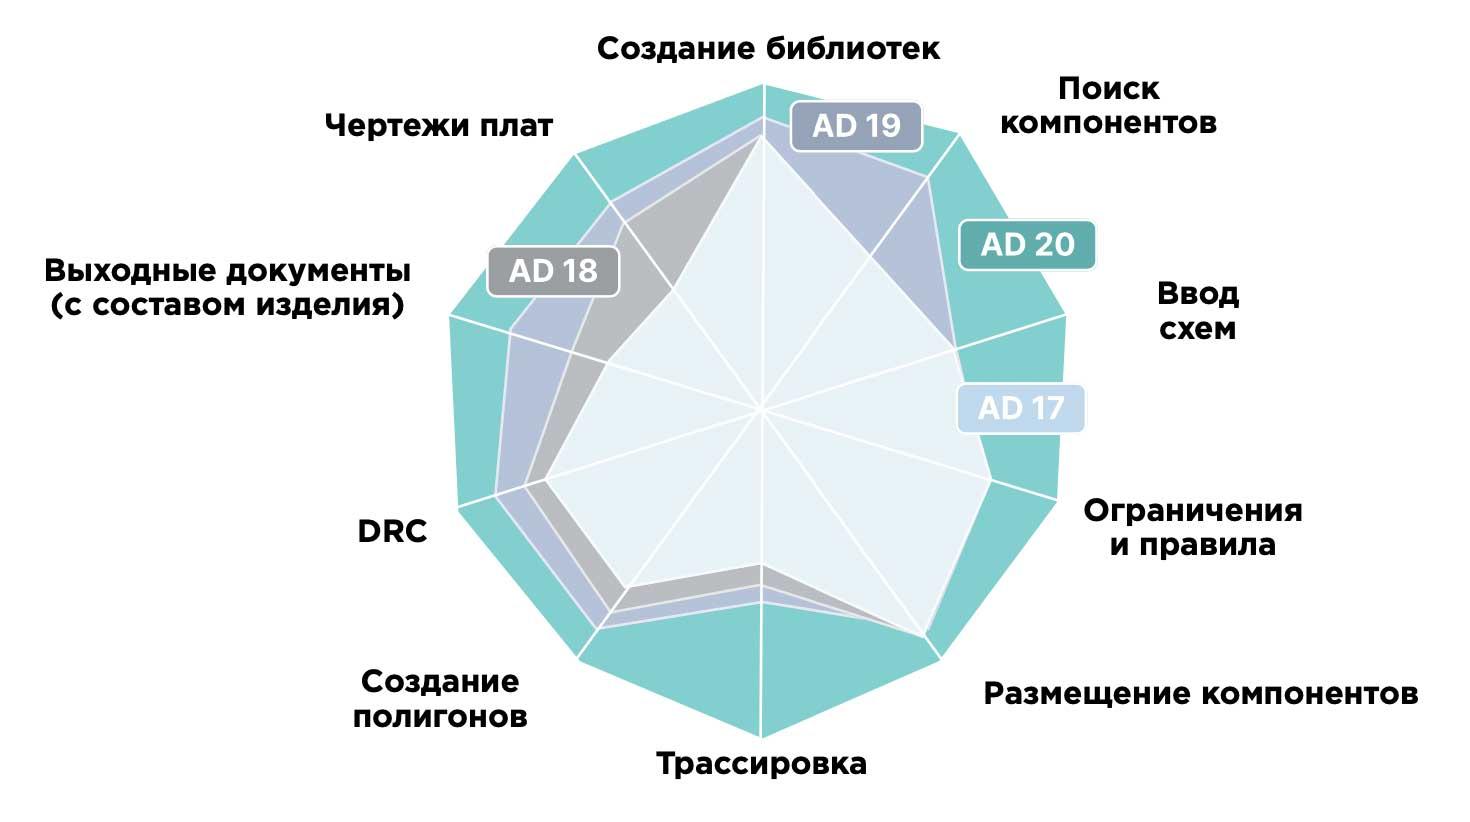 Altium Designer 20 Расширение лидерства